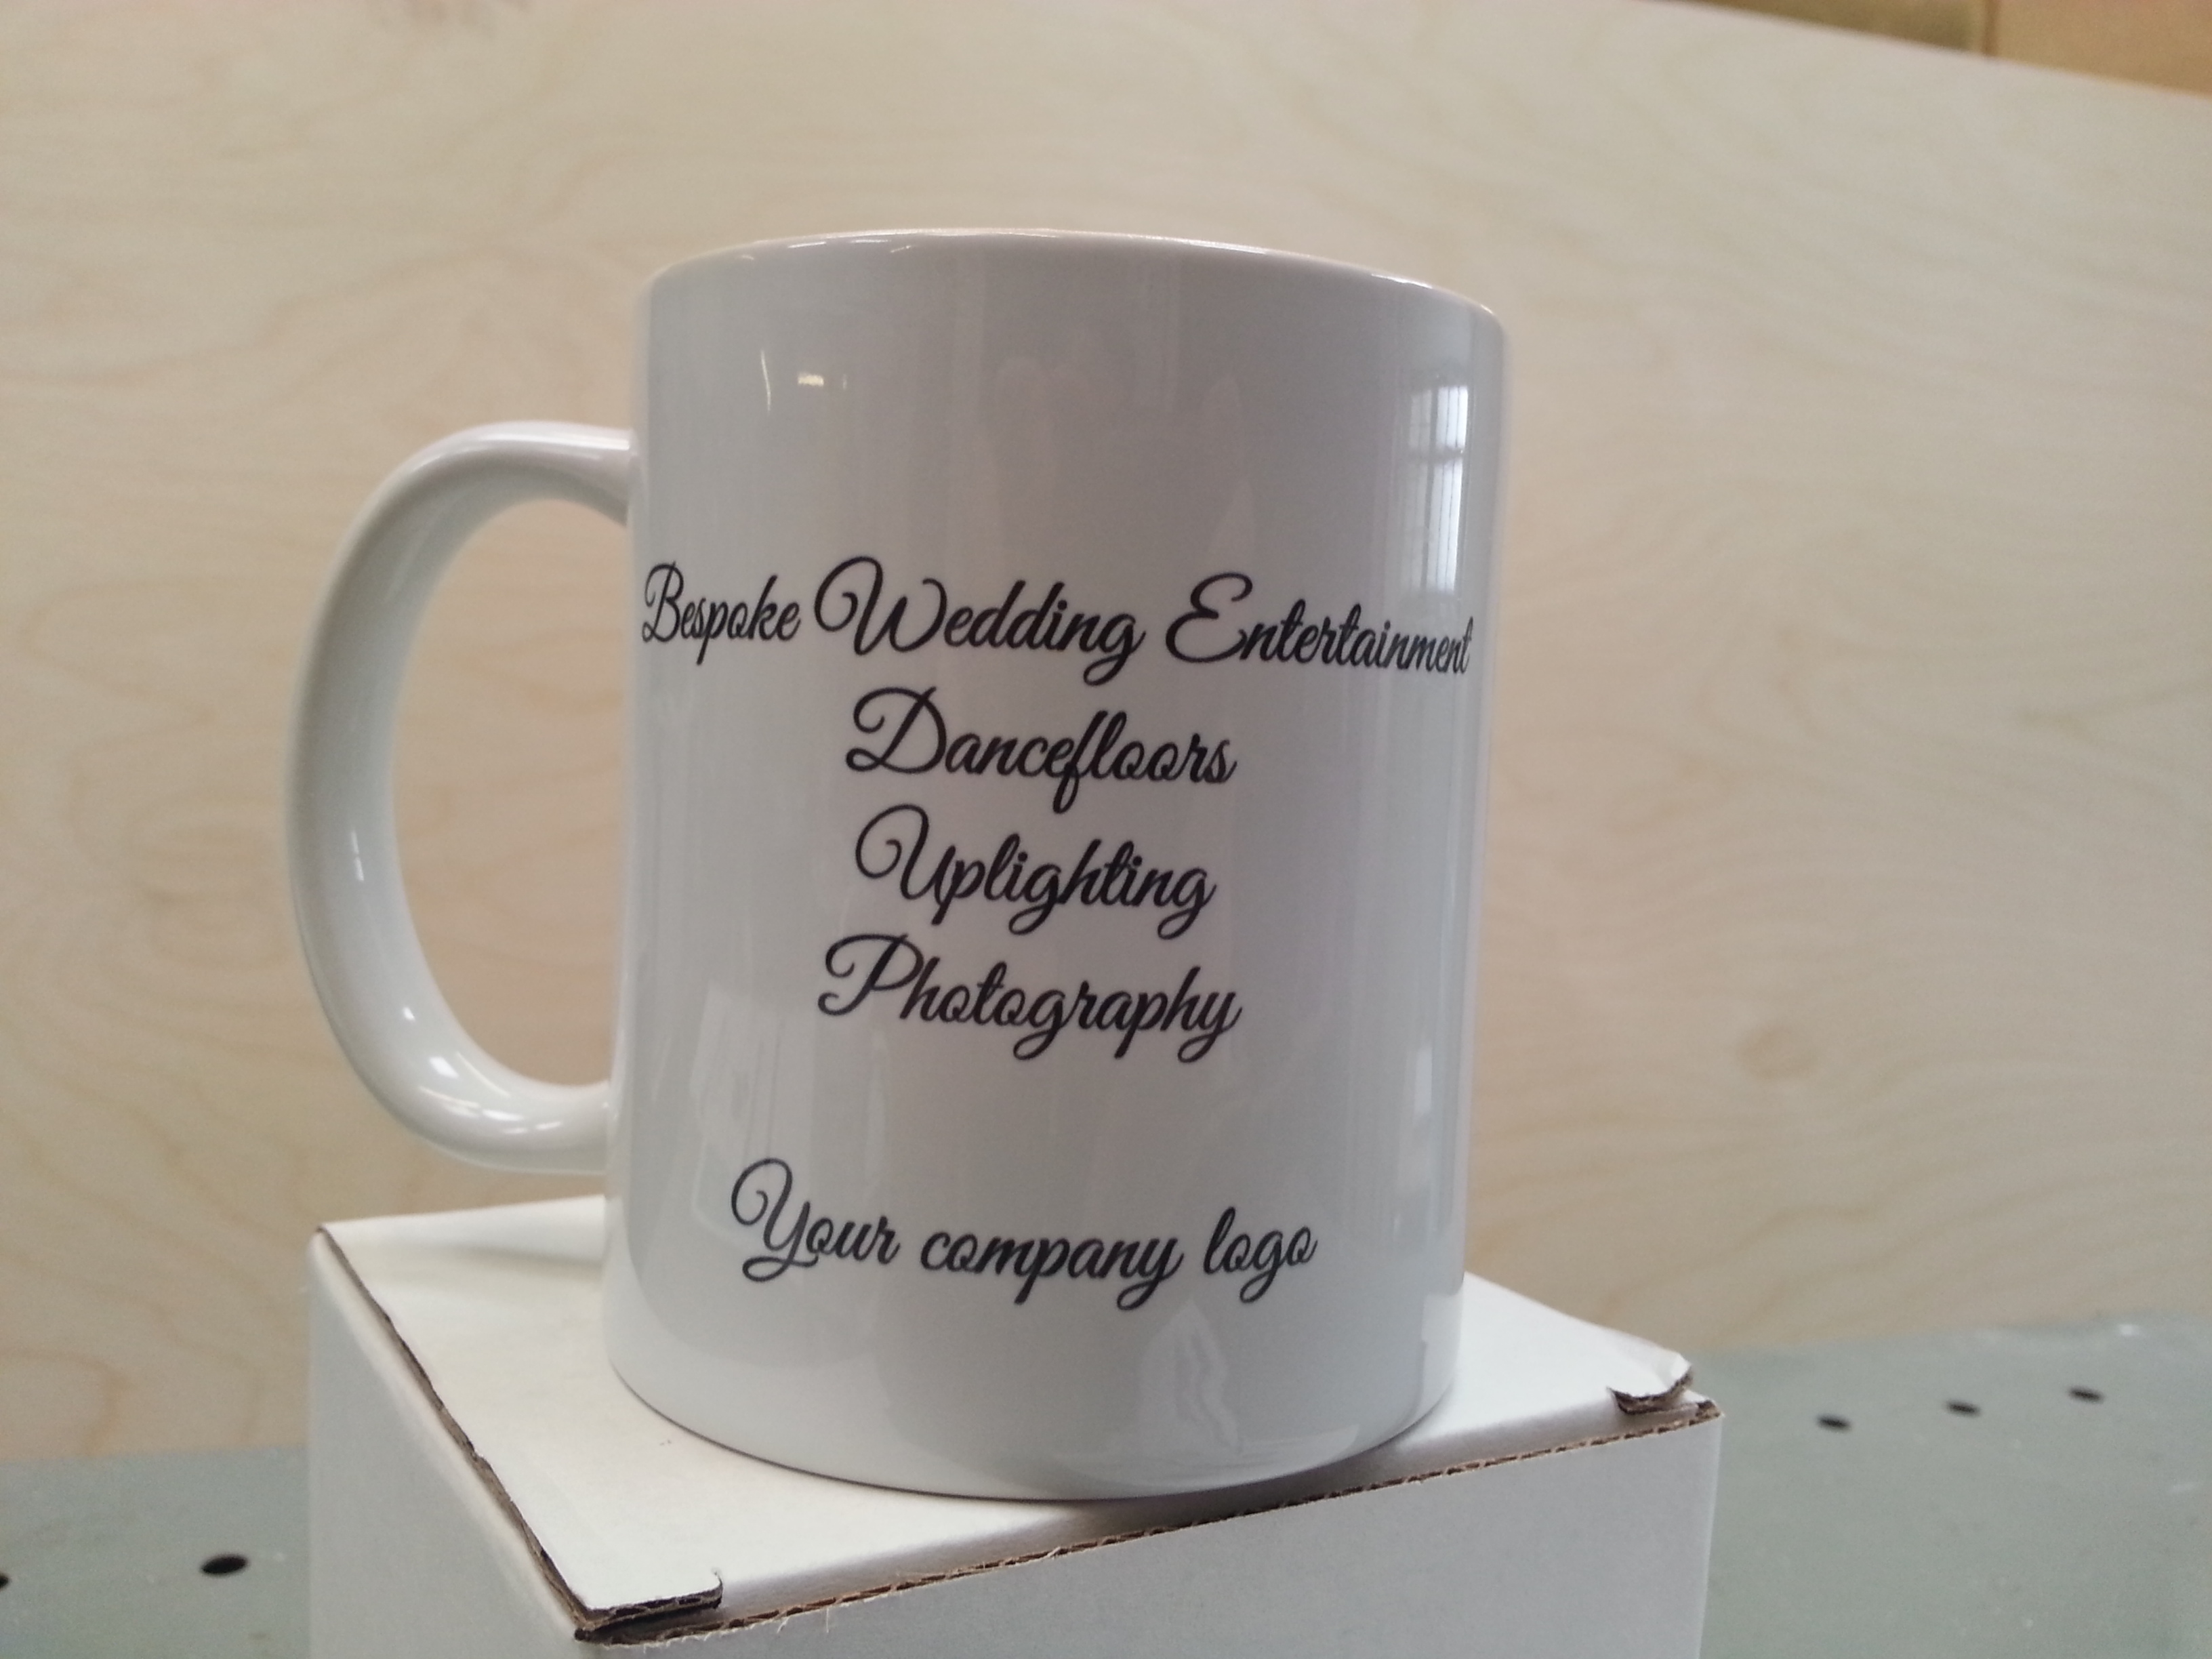 Beautiful mugs made to order